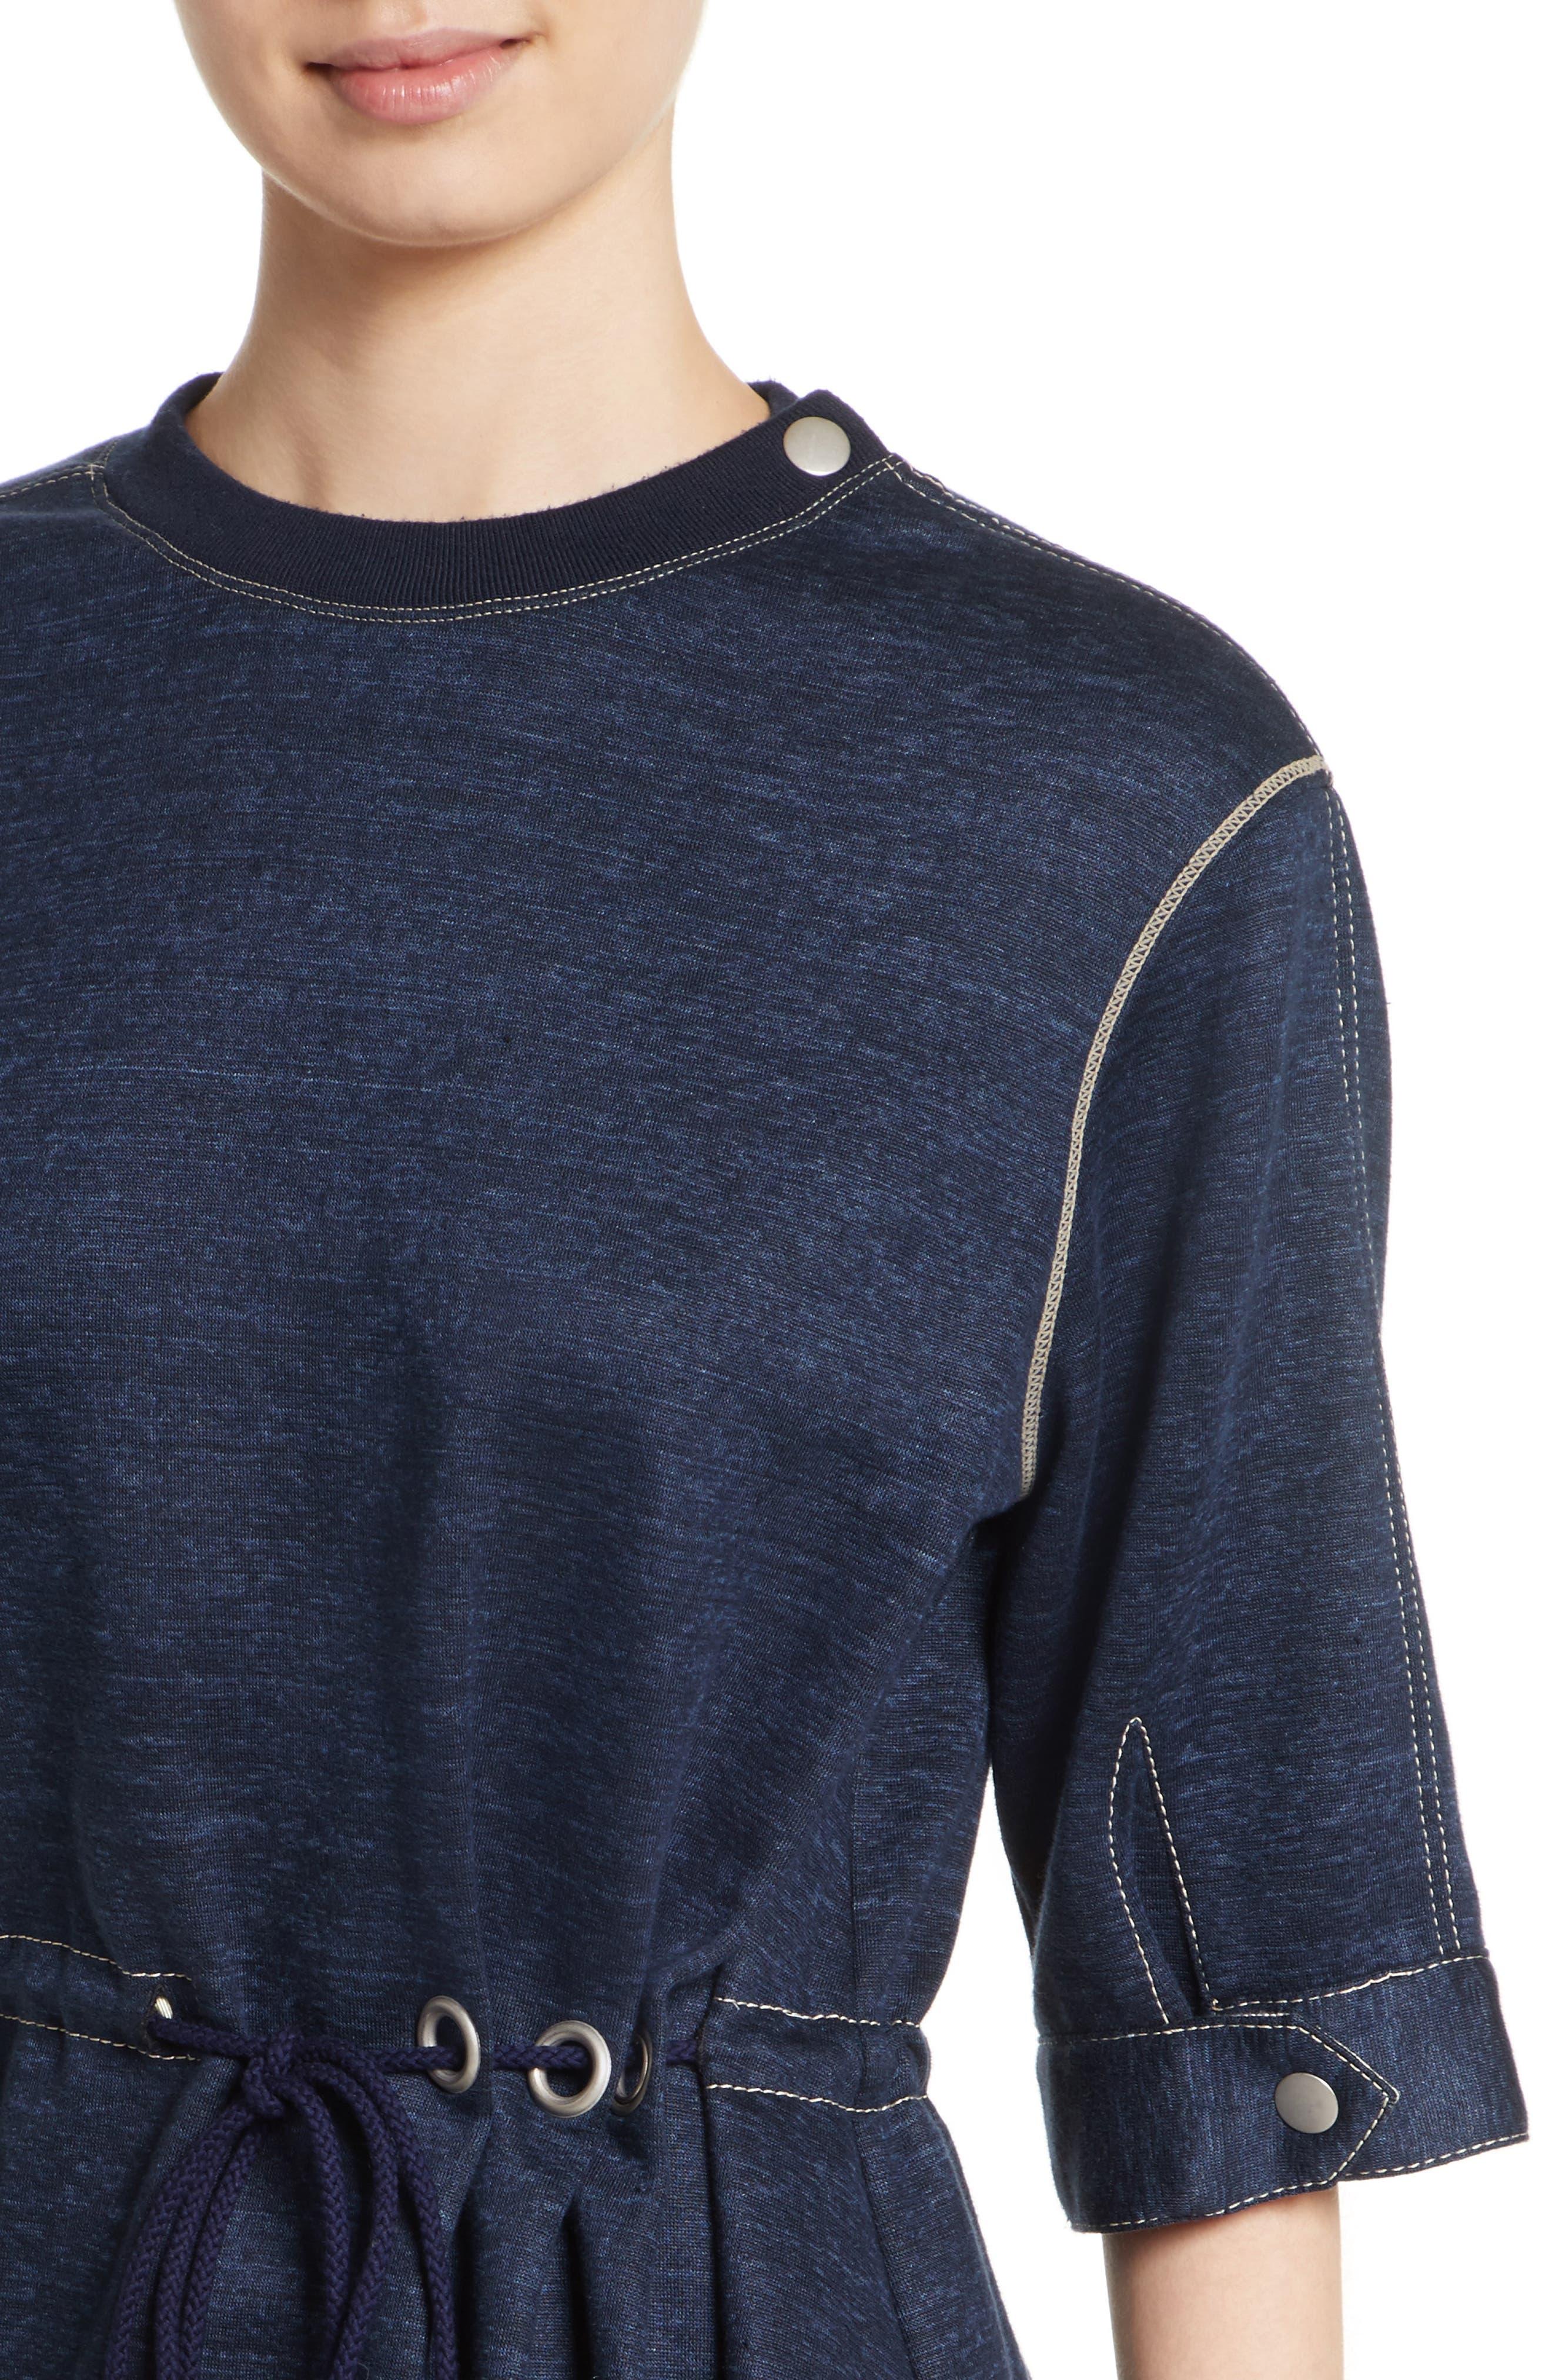 Drawstring Waist Sweatshirt Top,                             Alternate thumbnail 4, color,                             410